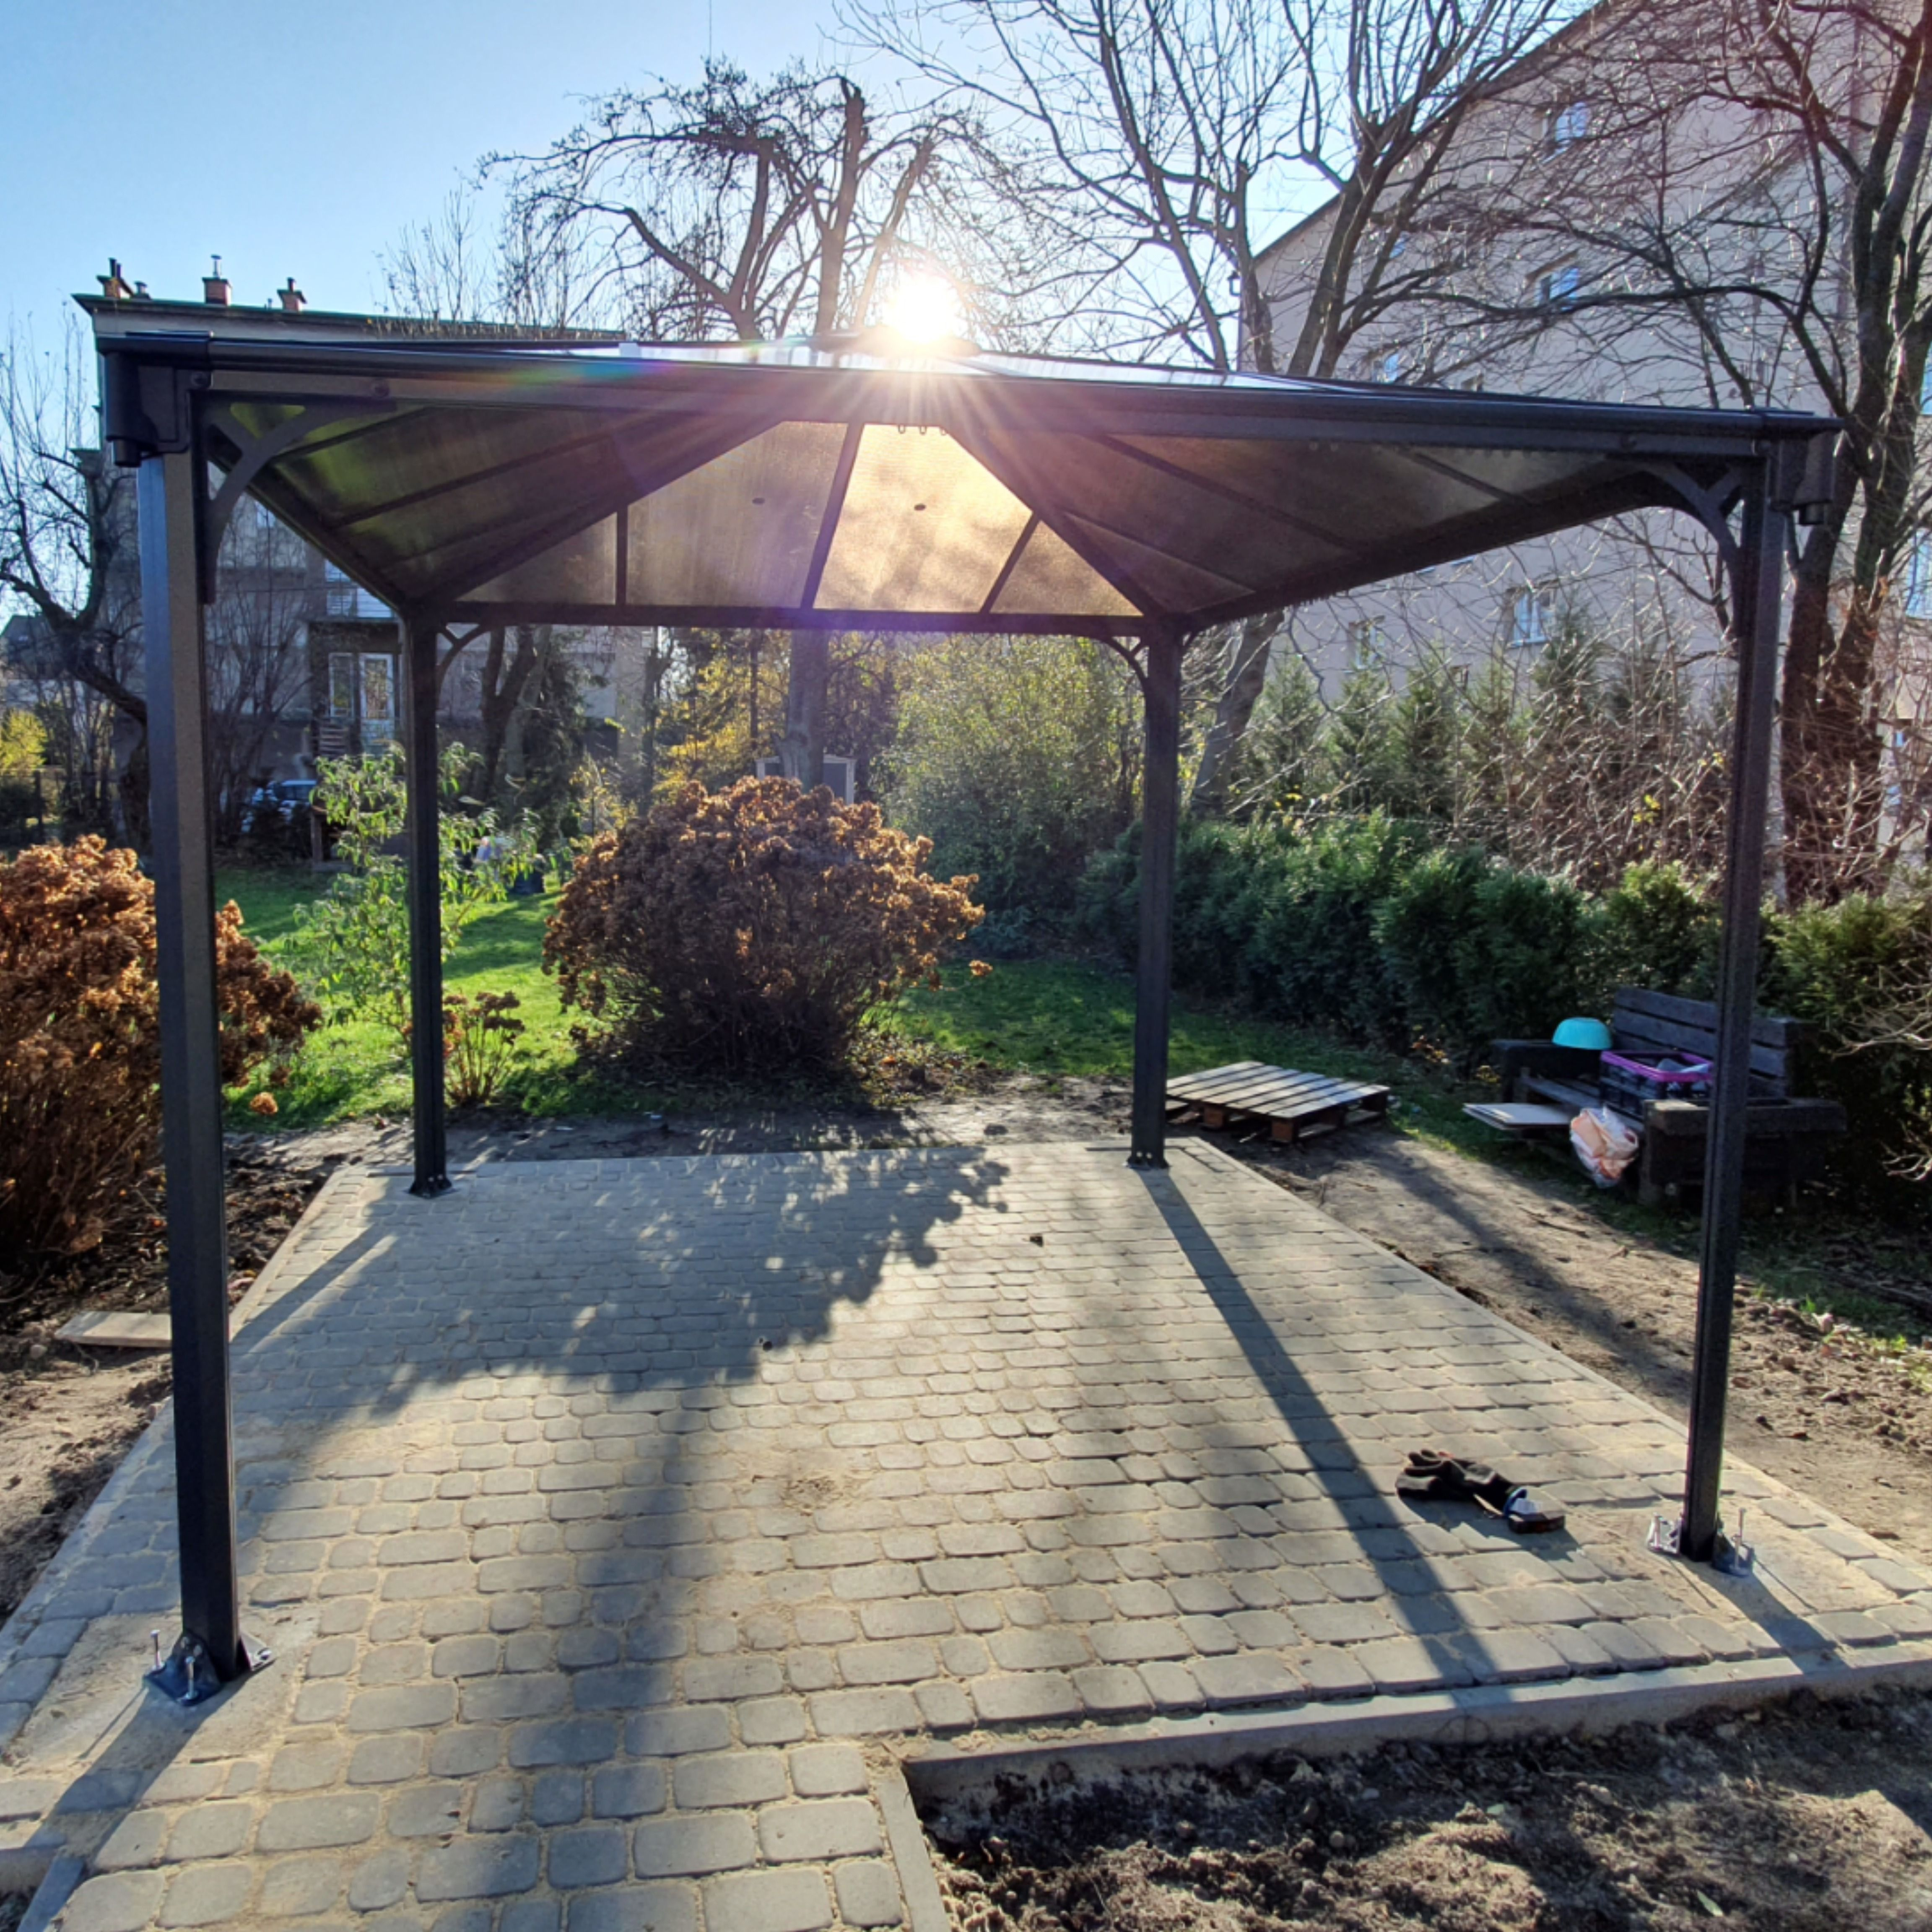 Nowoczesna Altana Metalowa Palermo 3 6 X 3 6 M Altany Ogrodowe Outdoor Patio Umbrella Outdoor Decor